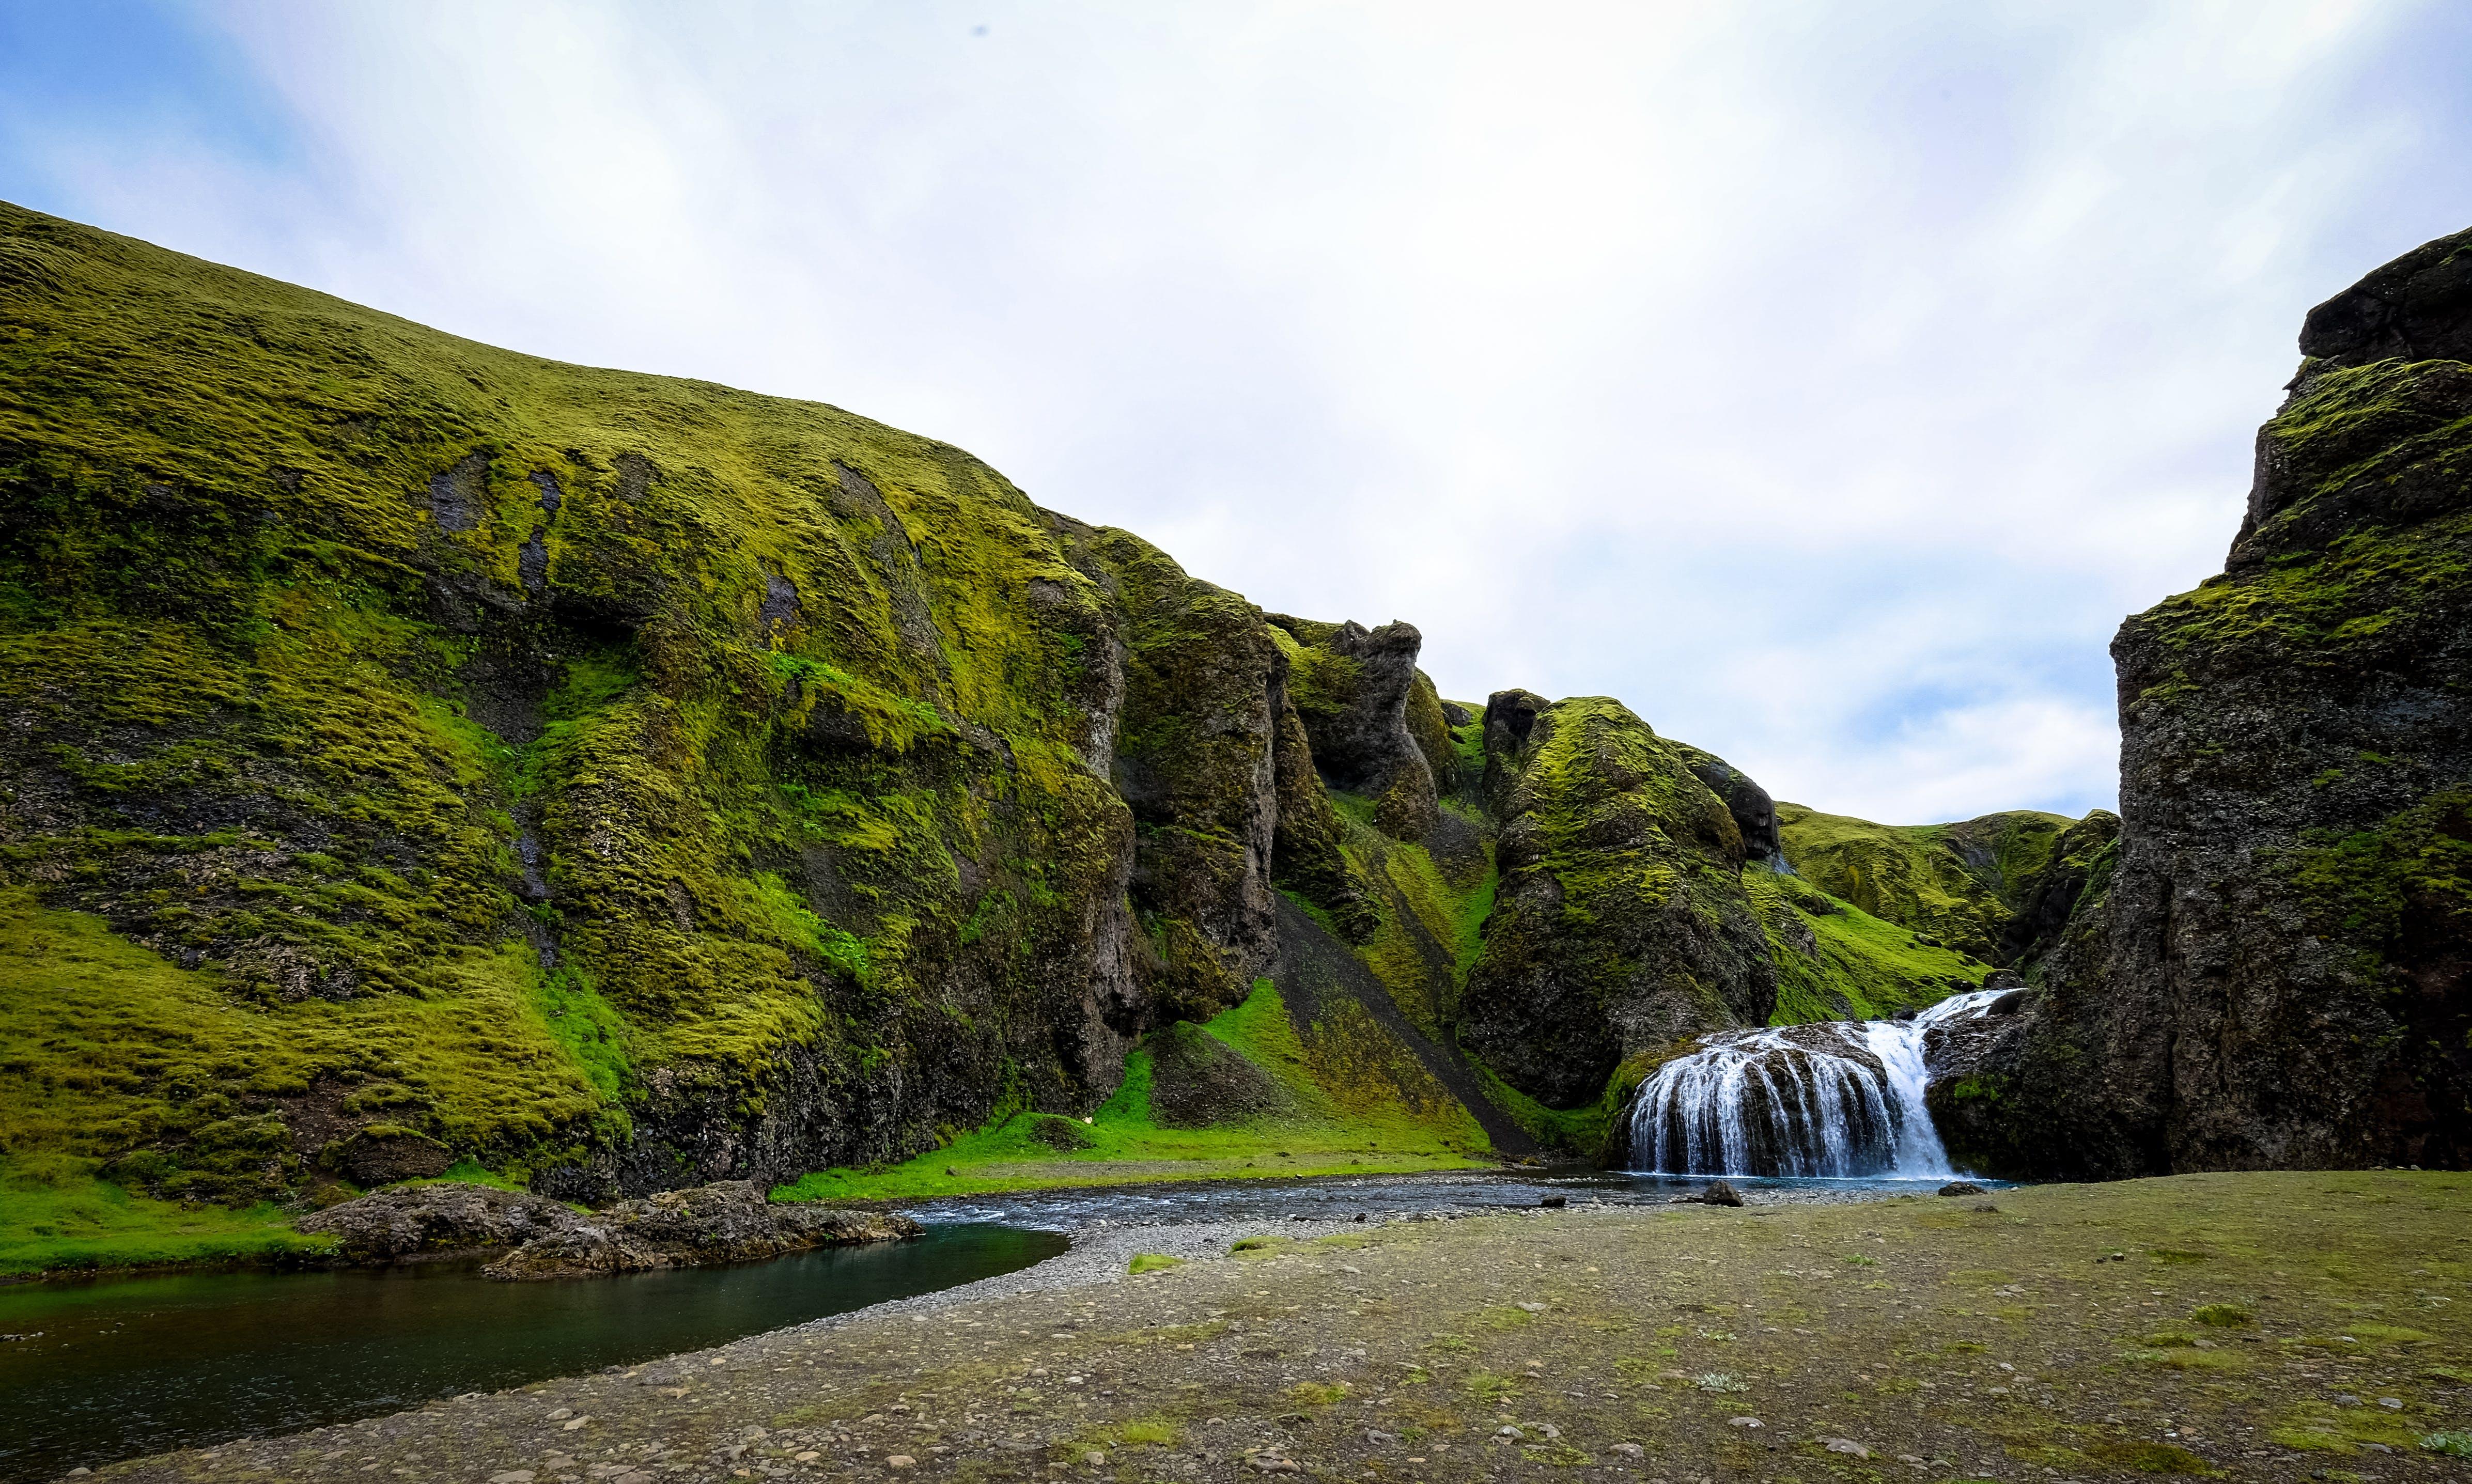 Waterfalls and Dirt